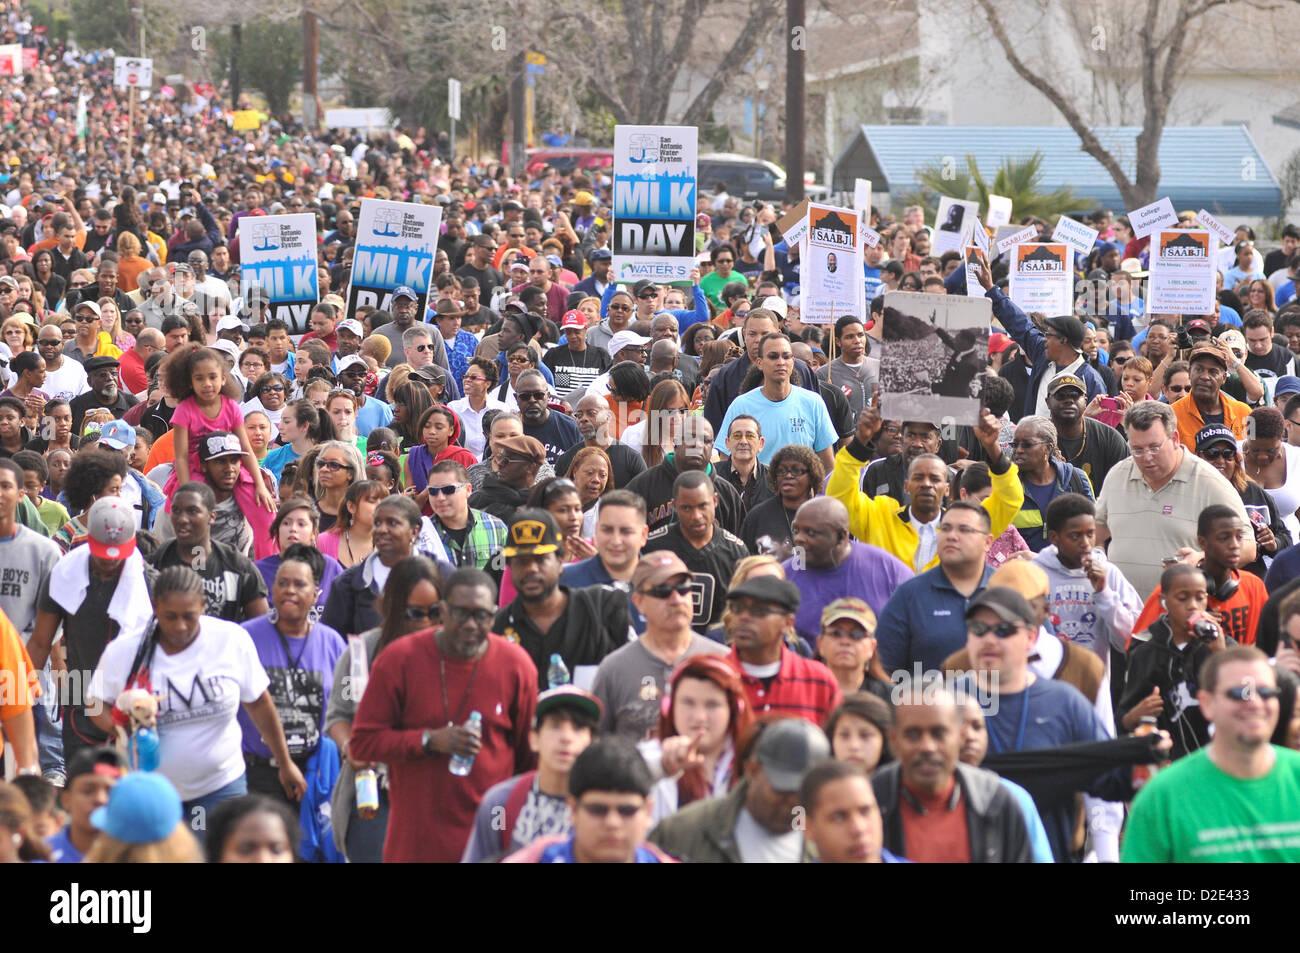 Jan 21 2013 San Antonio Texas Usa An Estimated 100 000